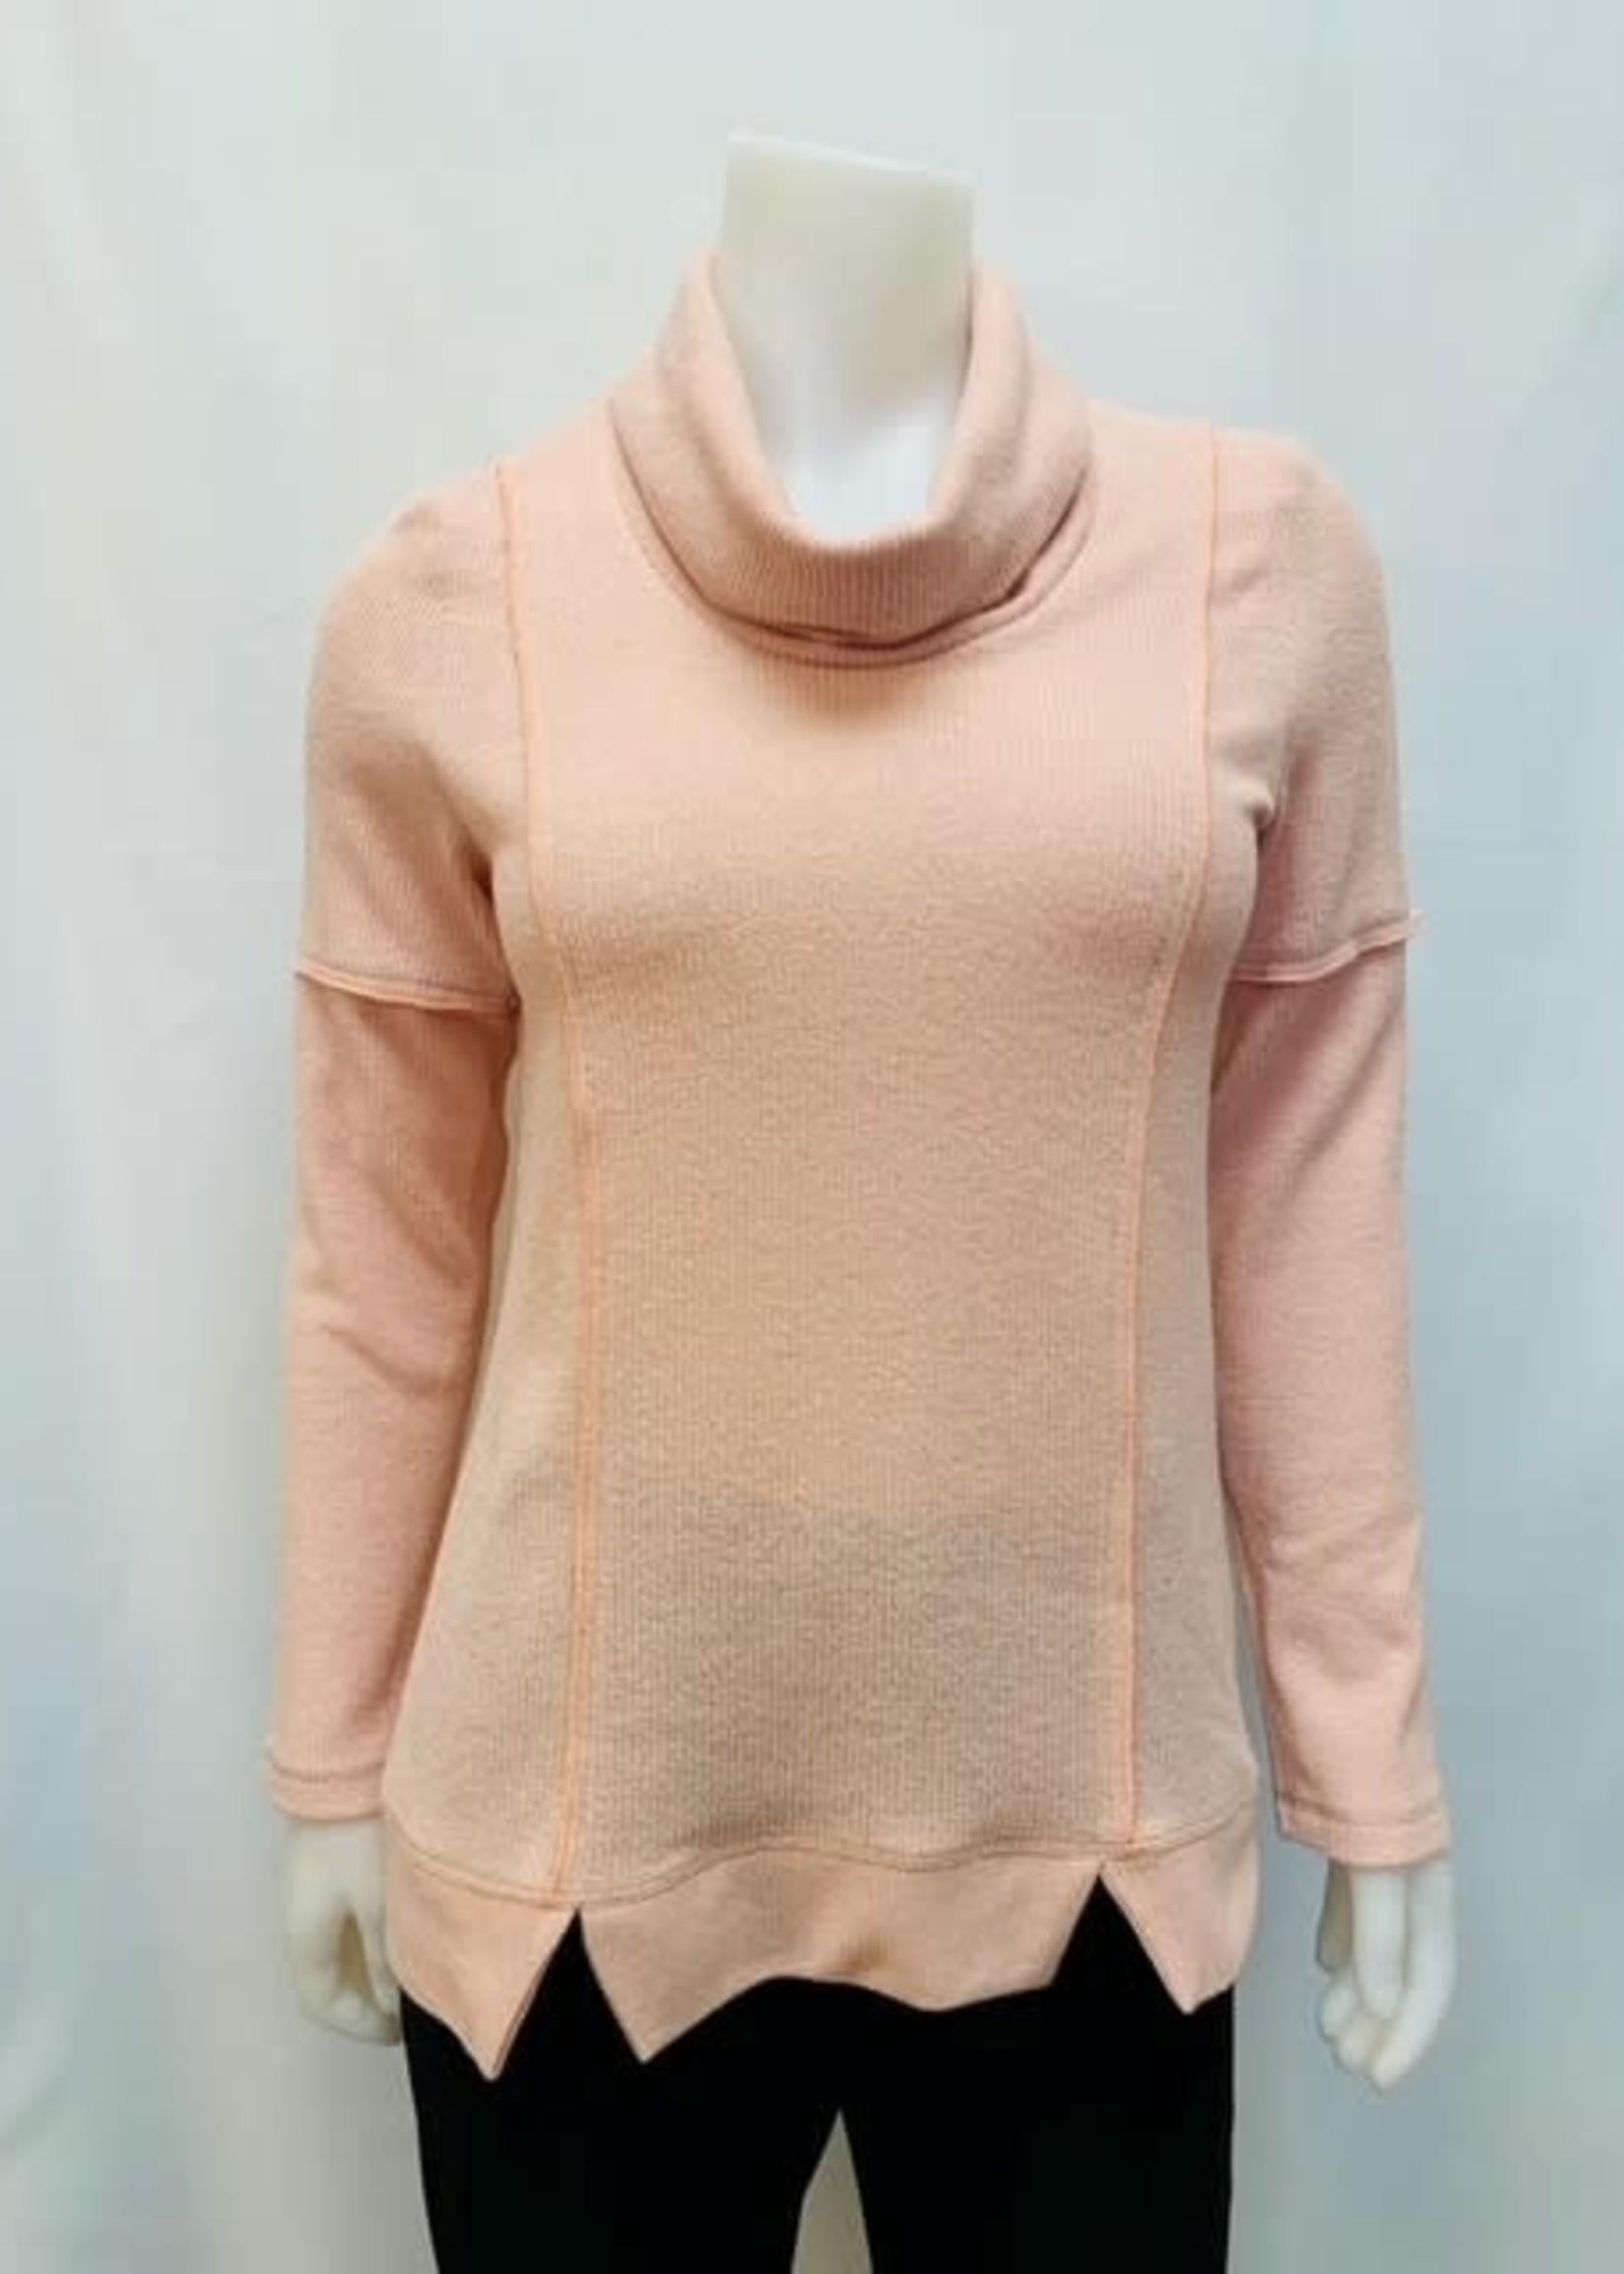 Bali Cowl neck sweater